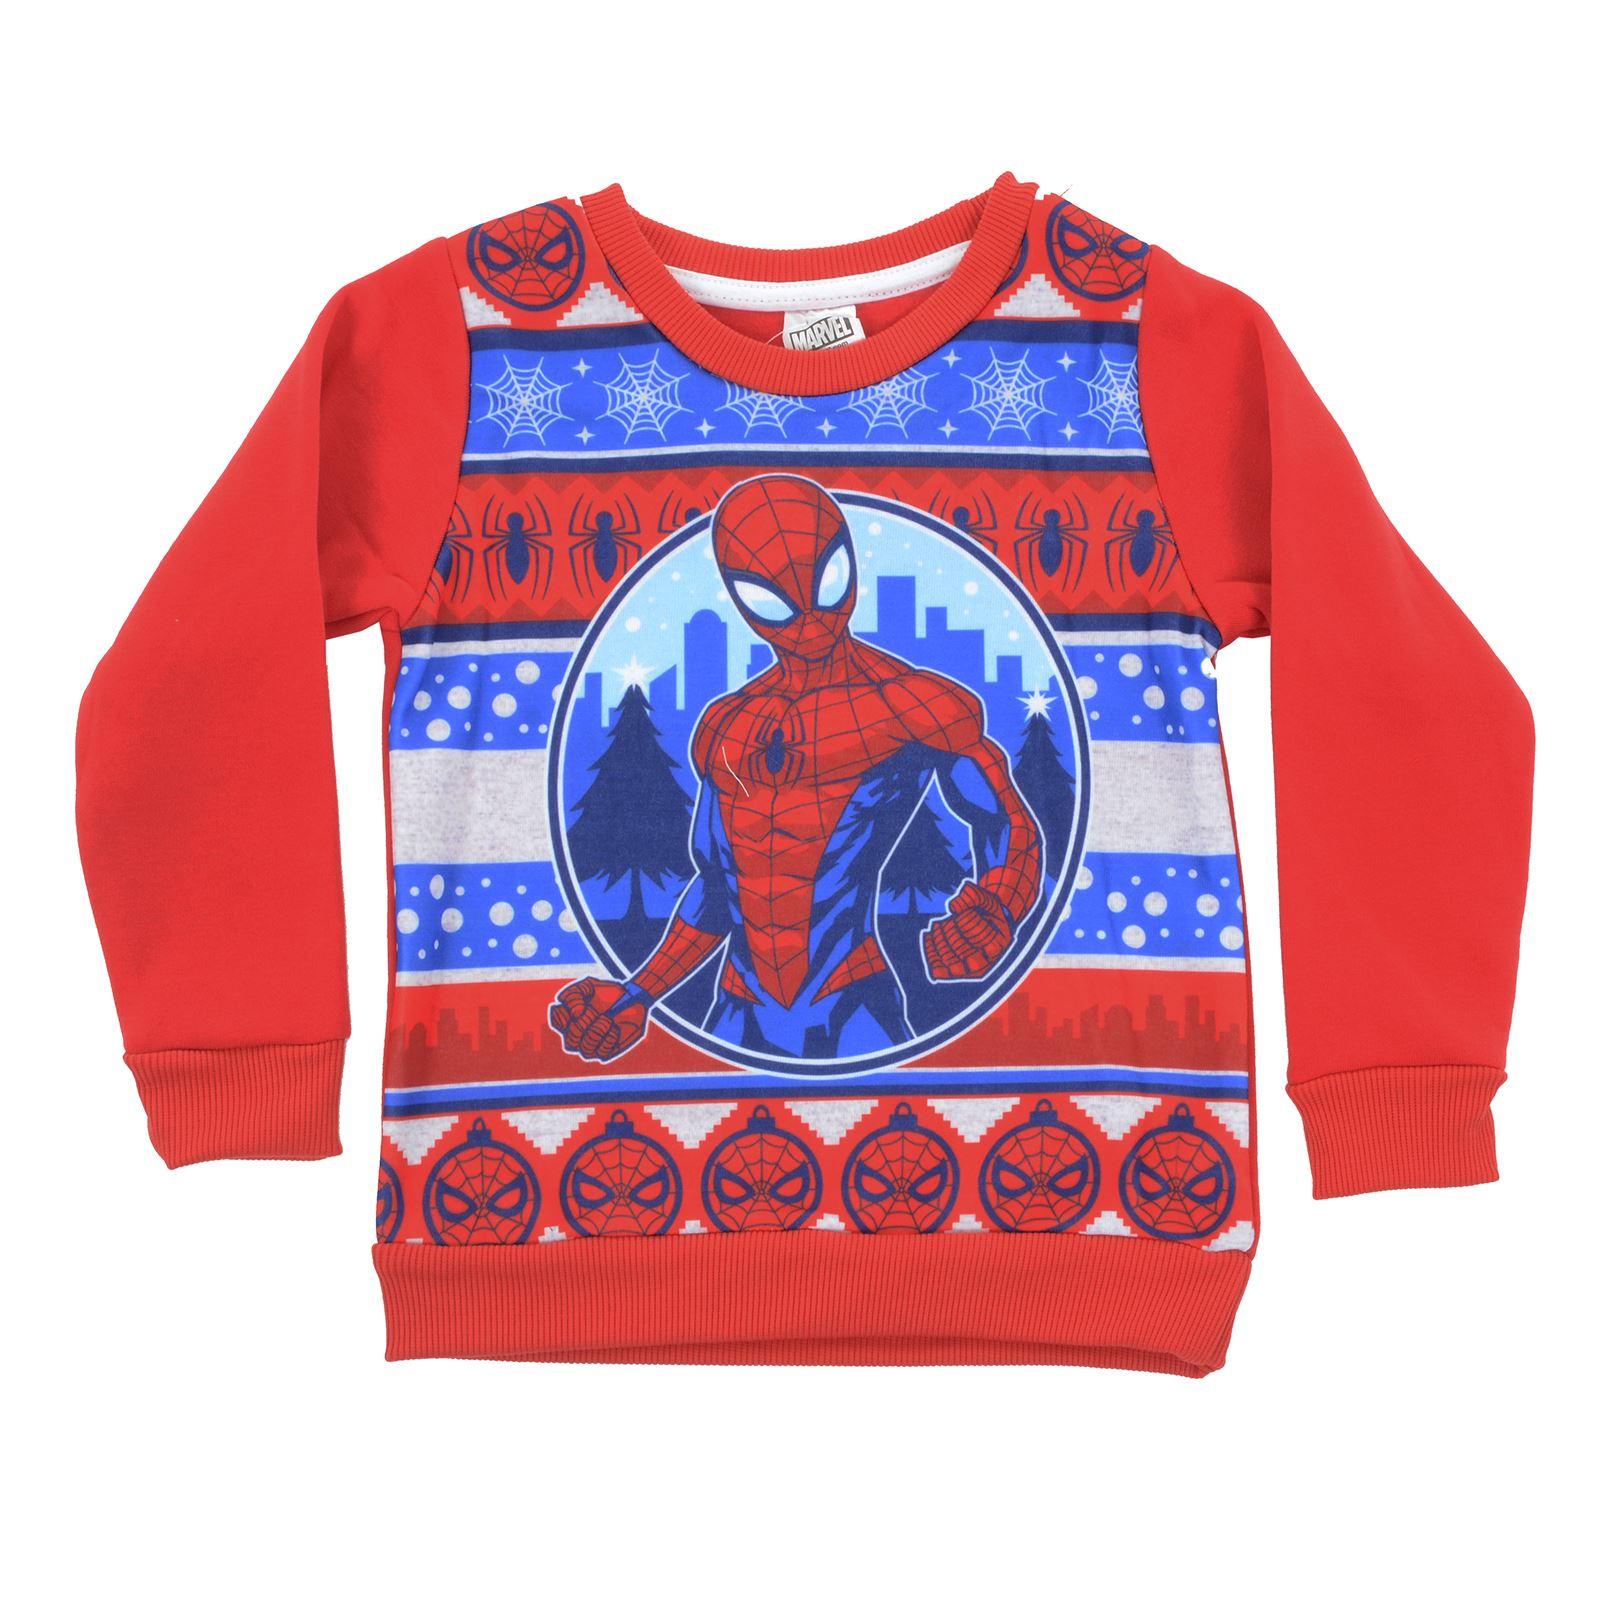 Spiderman Christmas.Details About Kids Marvel Spiderman Christmas Jumper Red Sweatshirt Xmas Spidey Superhero